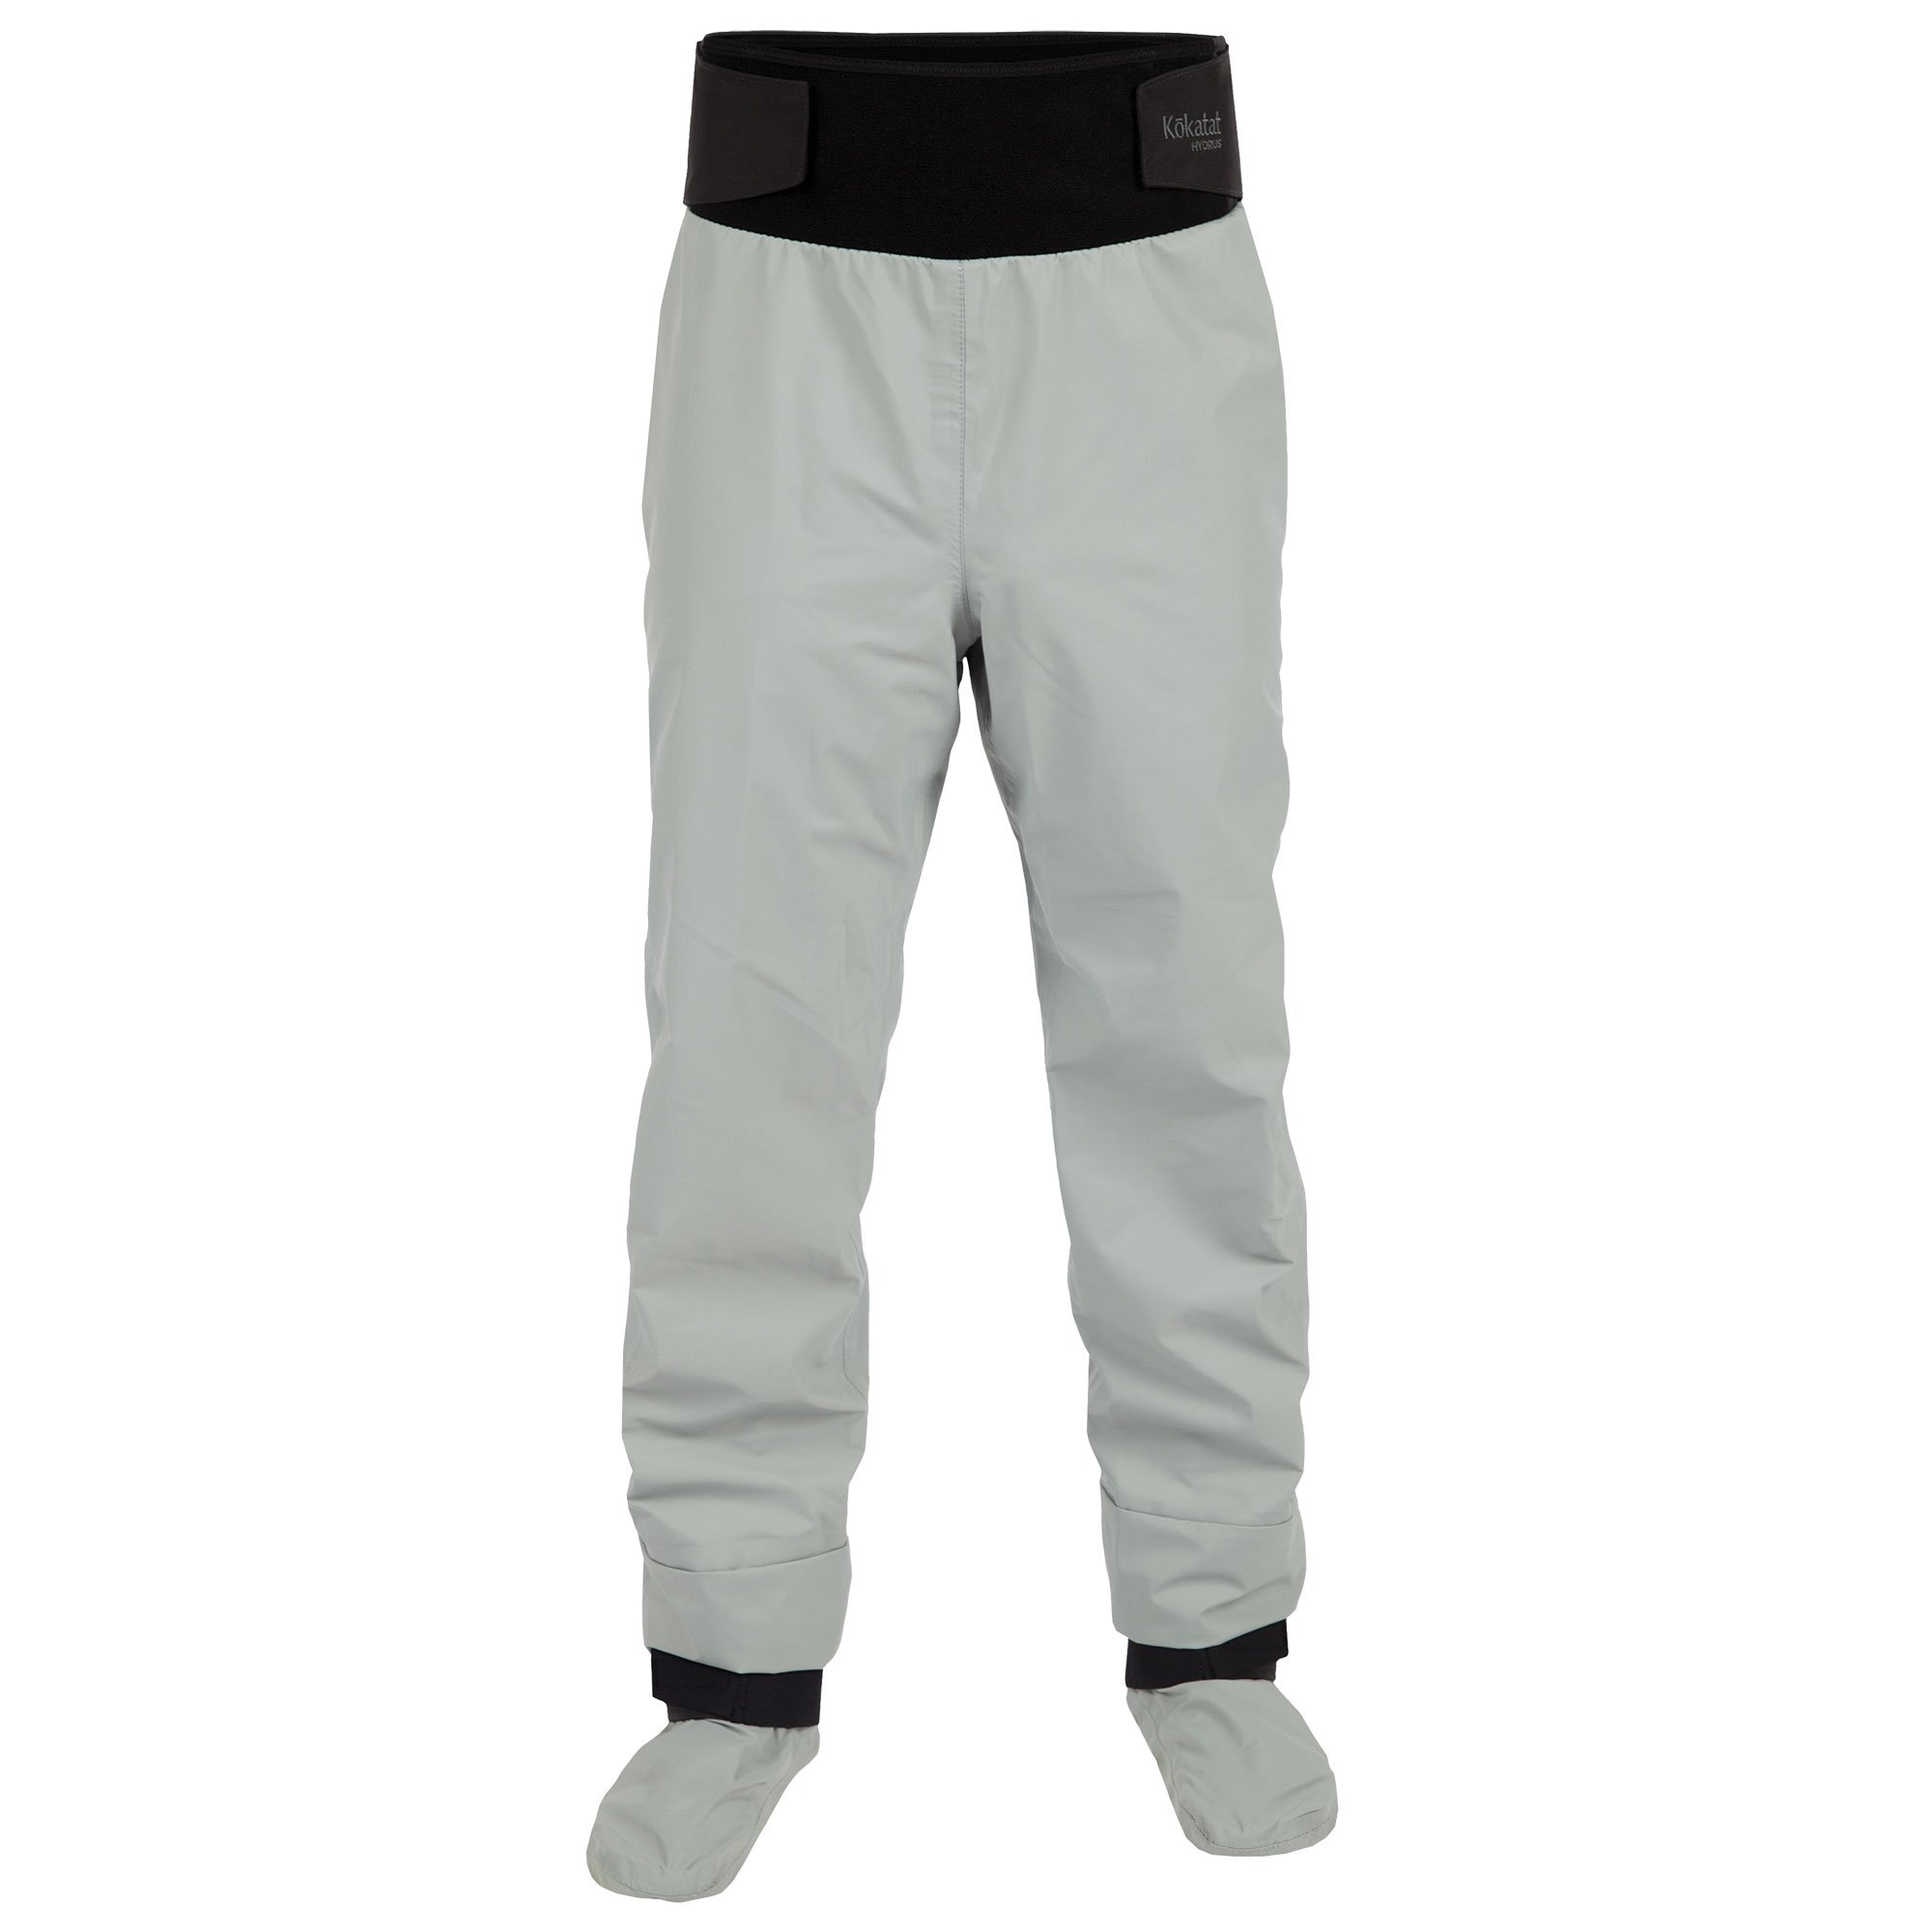 Kokatat Men's Hydrus Tempest Pants w/Socks-LightGray-XL by Kokatat